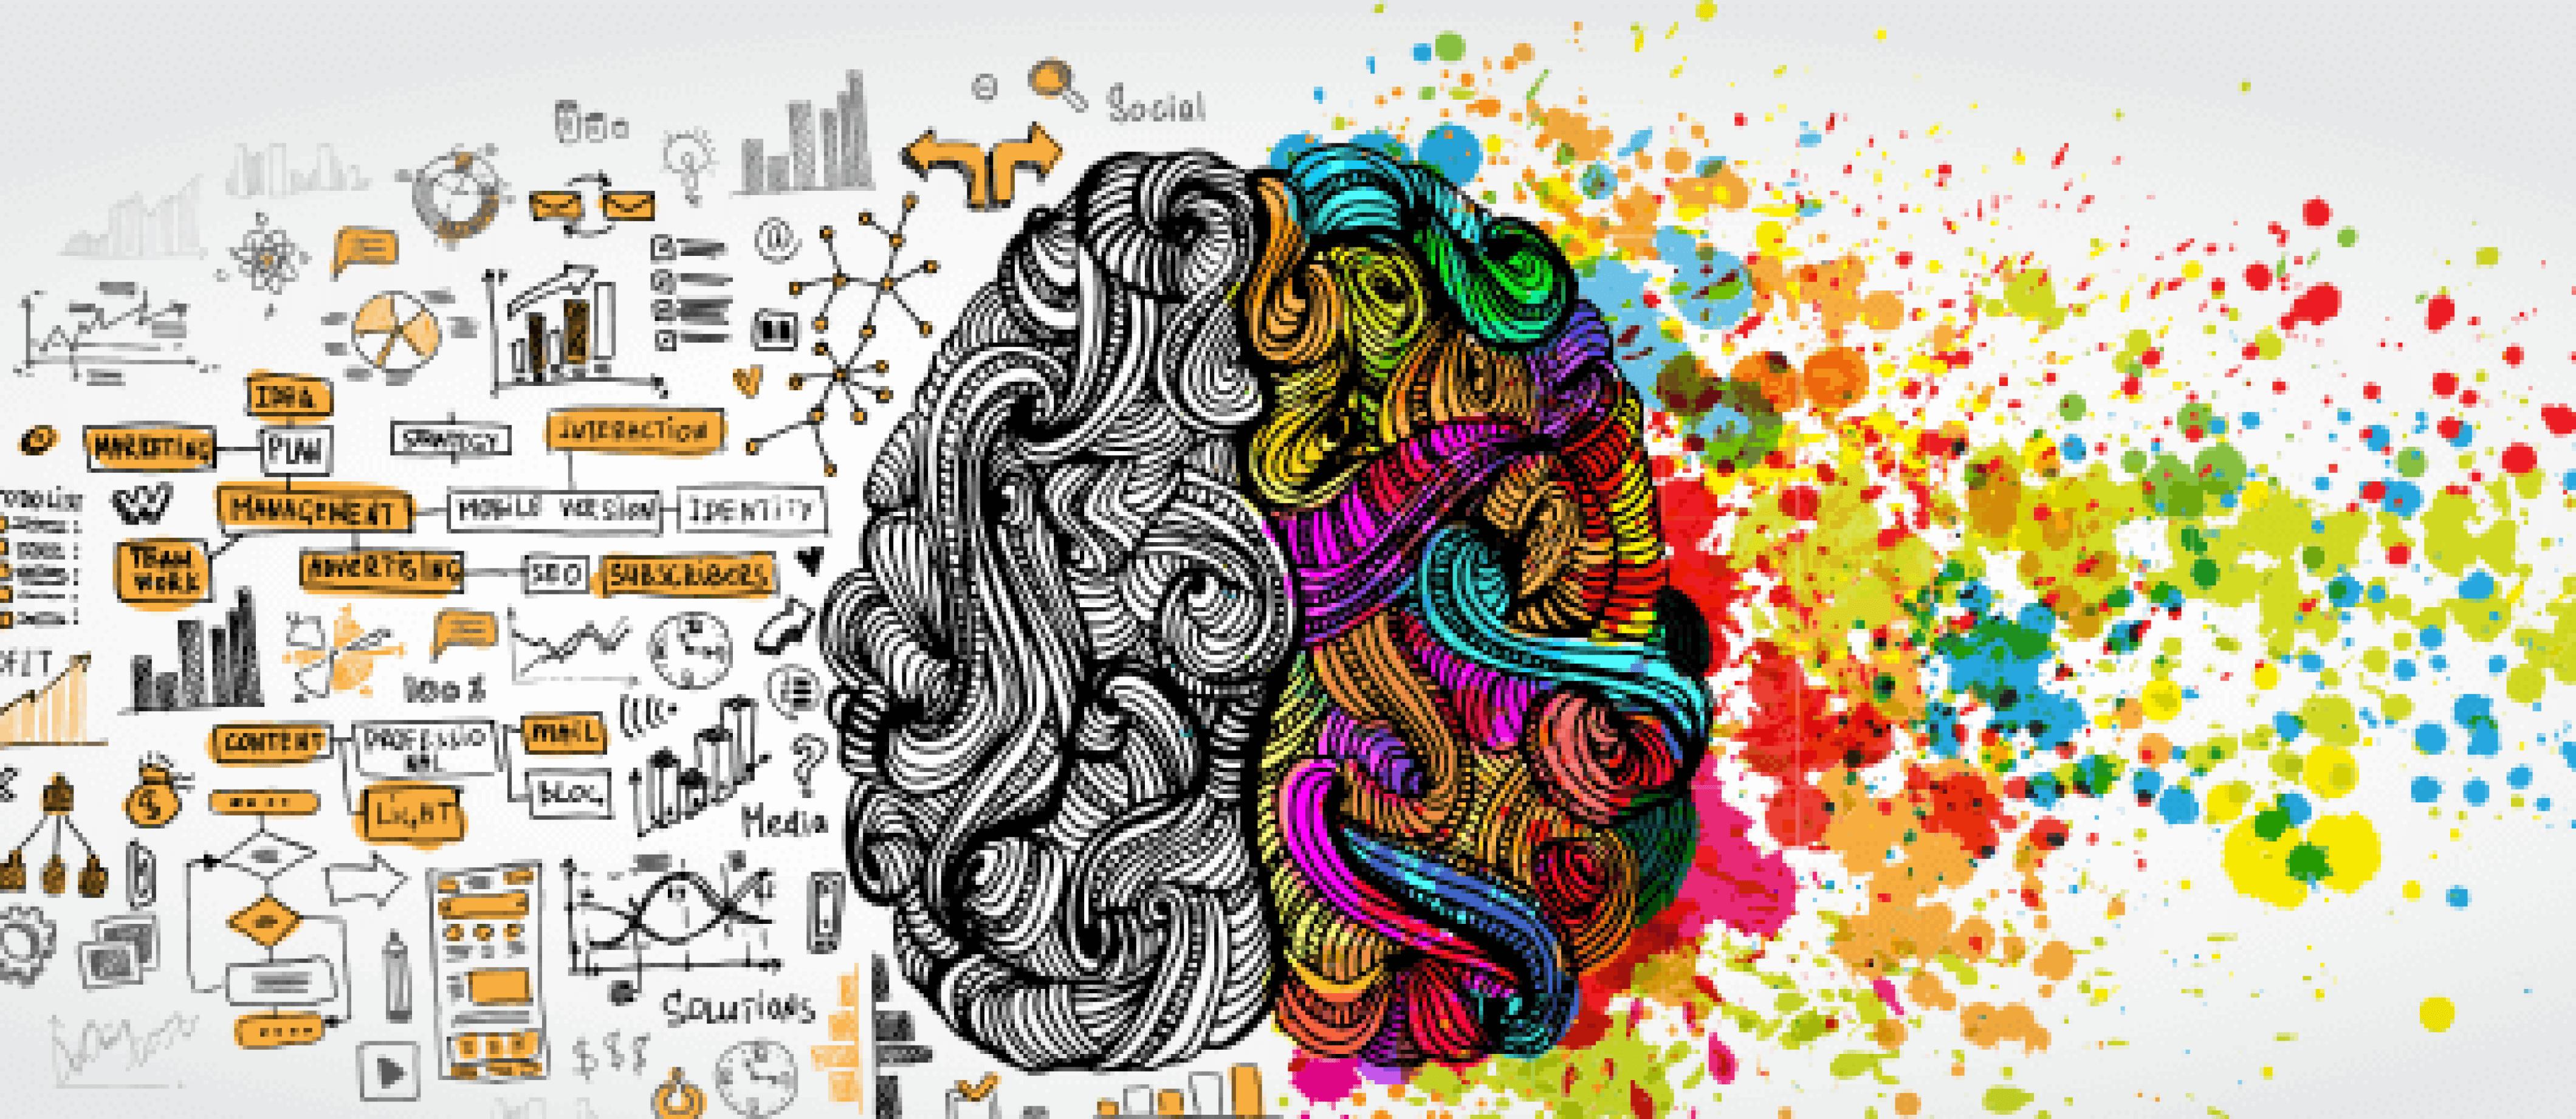 Terrific Minds - What the TECH V.20